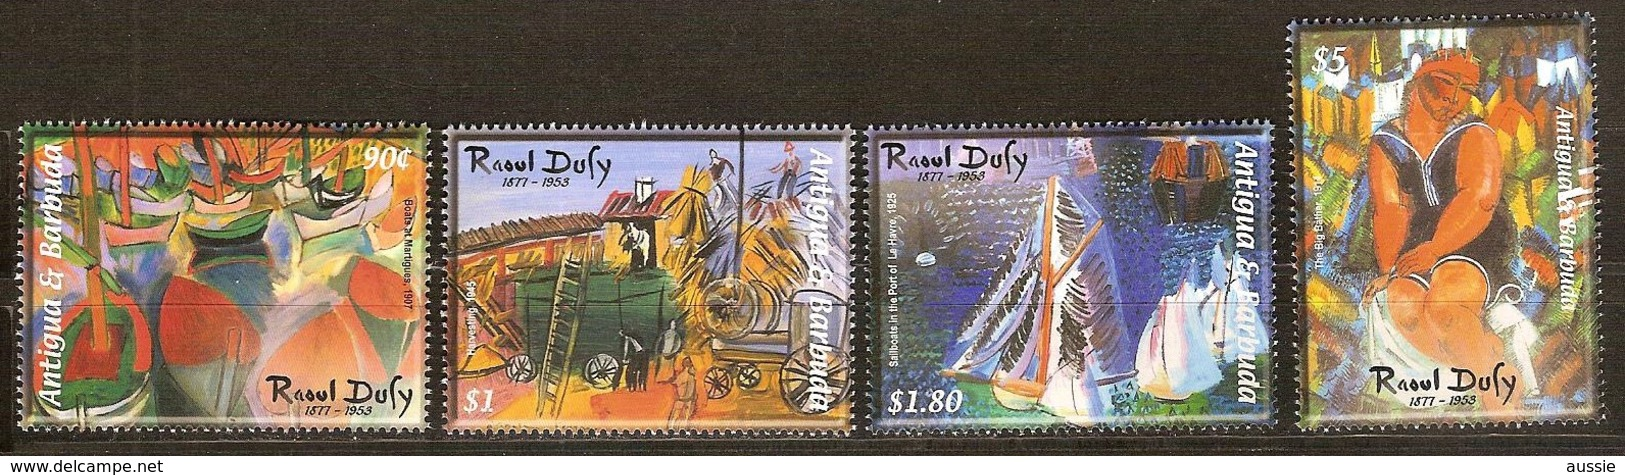 Antigua & Barbuda 2003 Yvertn° 3340-3343 *** MNH Cote 11,00 Euro Peintre Raoul Dufy - Antigua Et Barbuda (1981-...)